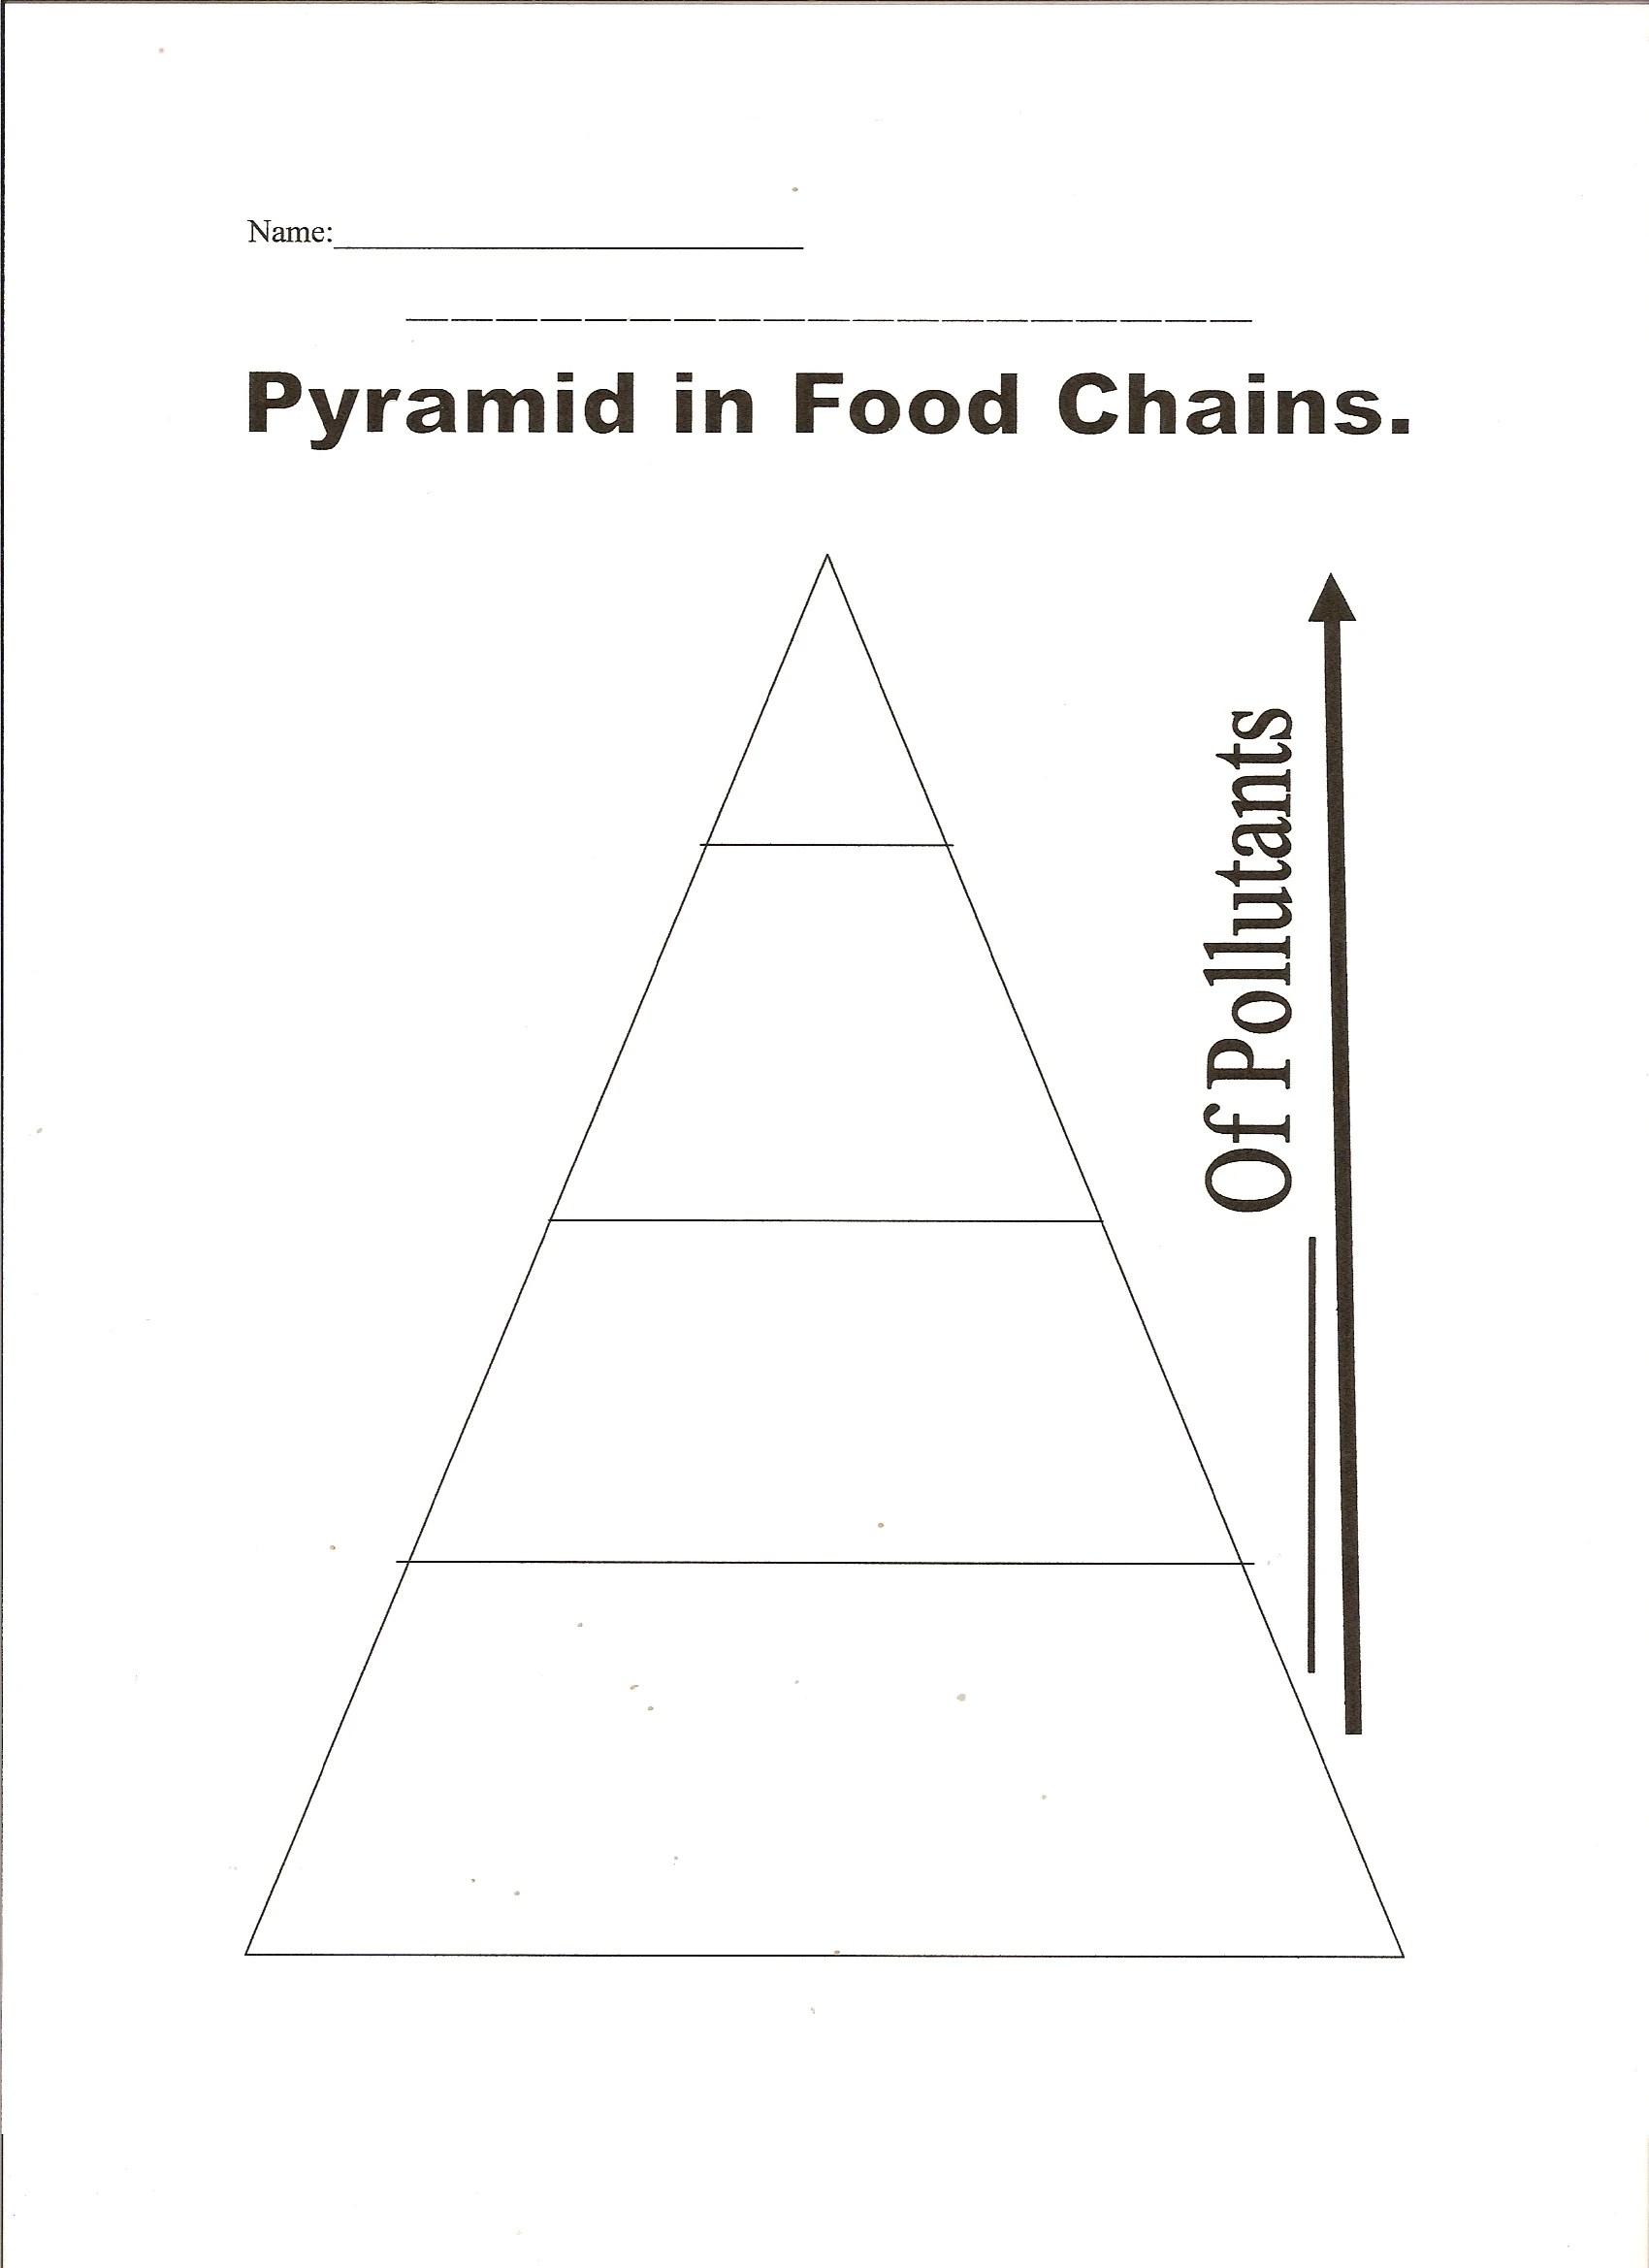 blank pyramid diagram 5 2003 saab 9 3 stereo wiring food web template chain